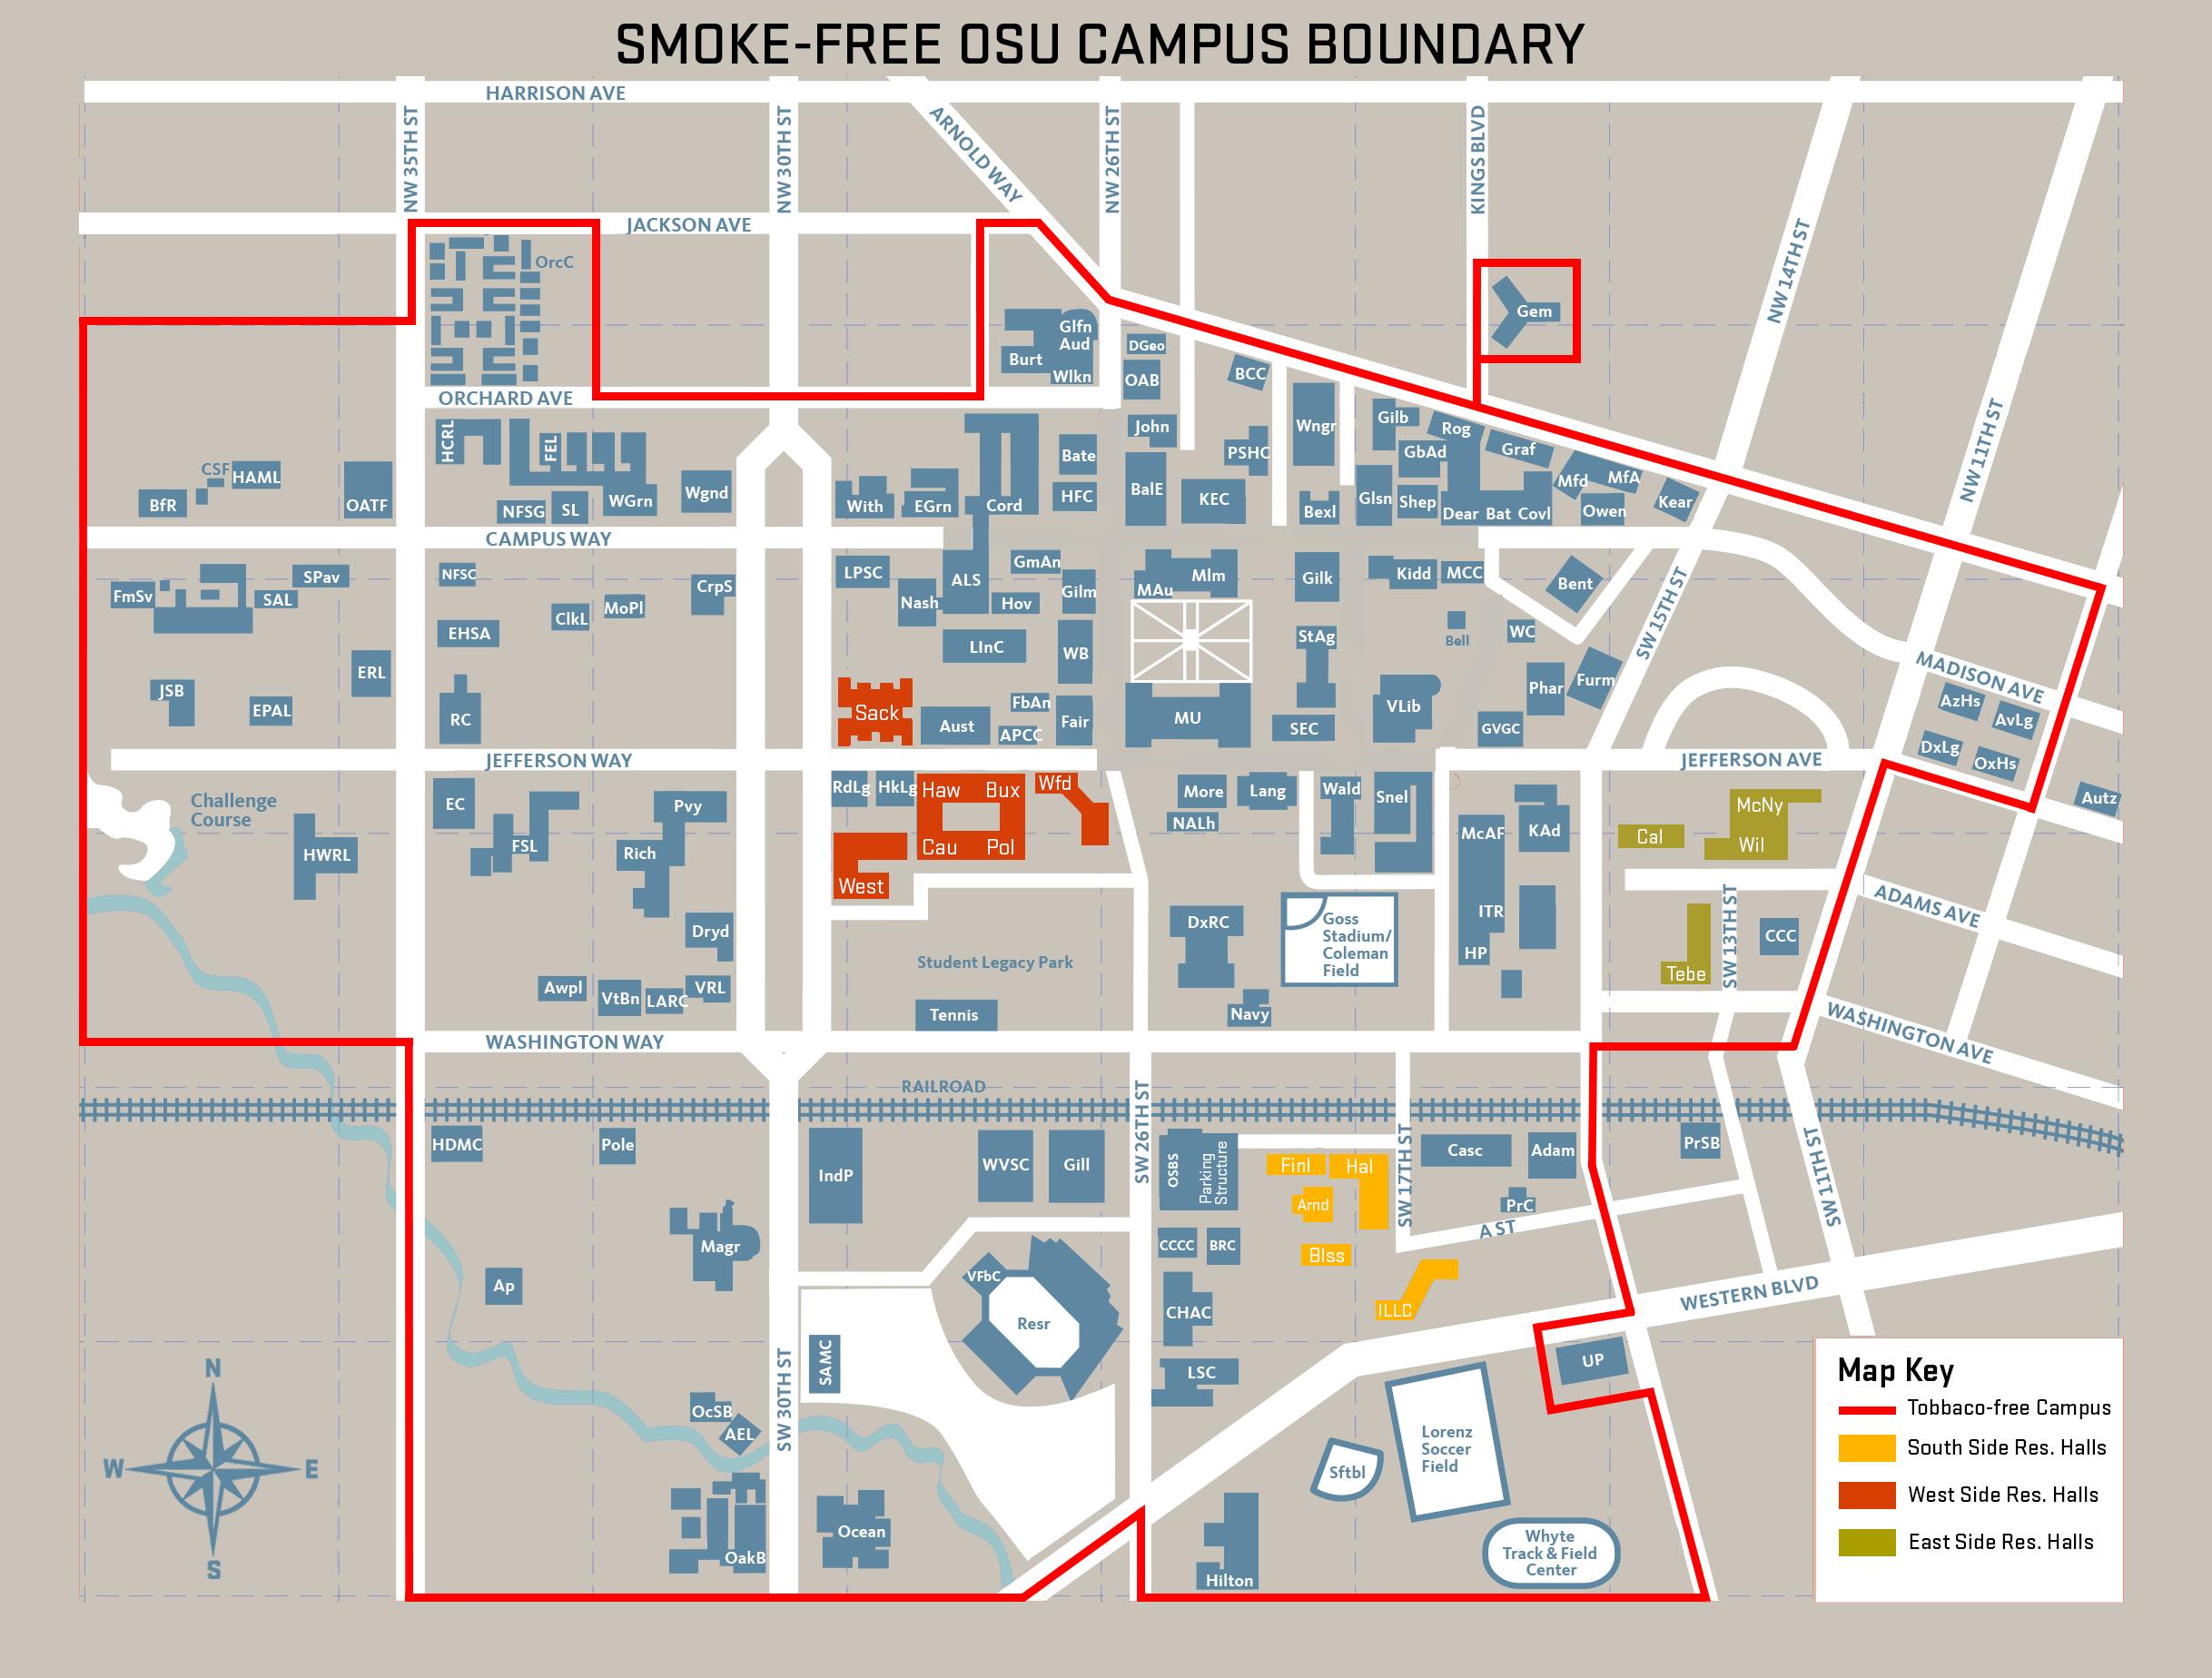 oregon state university campus map pdf Tobacco Free Policy Tobacco Free Osu Oregon State University oregon state university campus map pdf